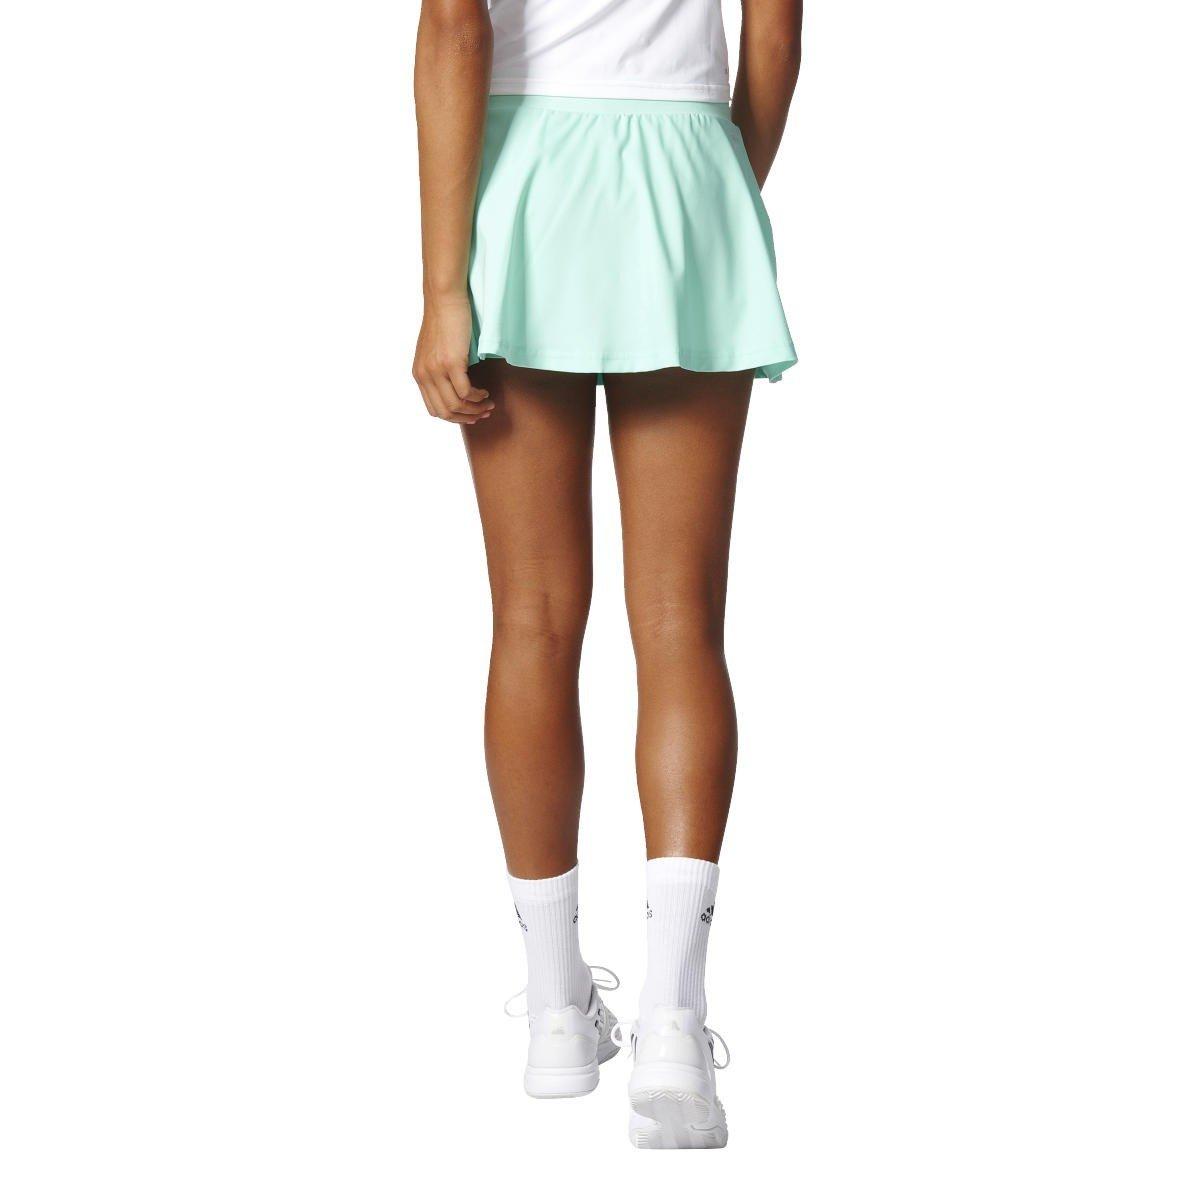 Adidas - BP8871 - Falda pantalon mujer tenis (XS): Amazon.es ...